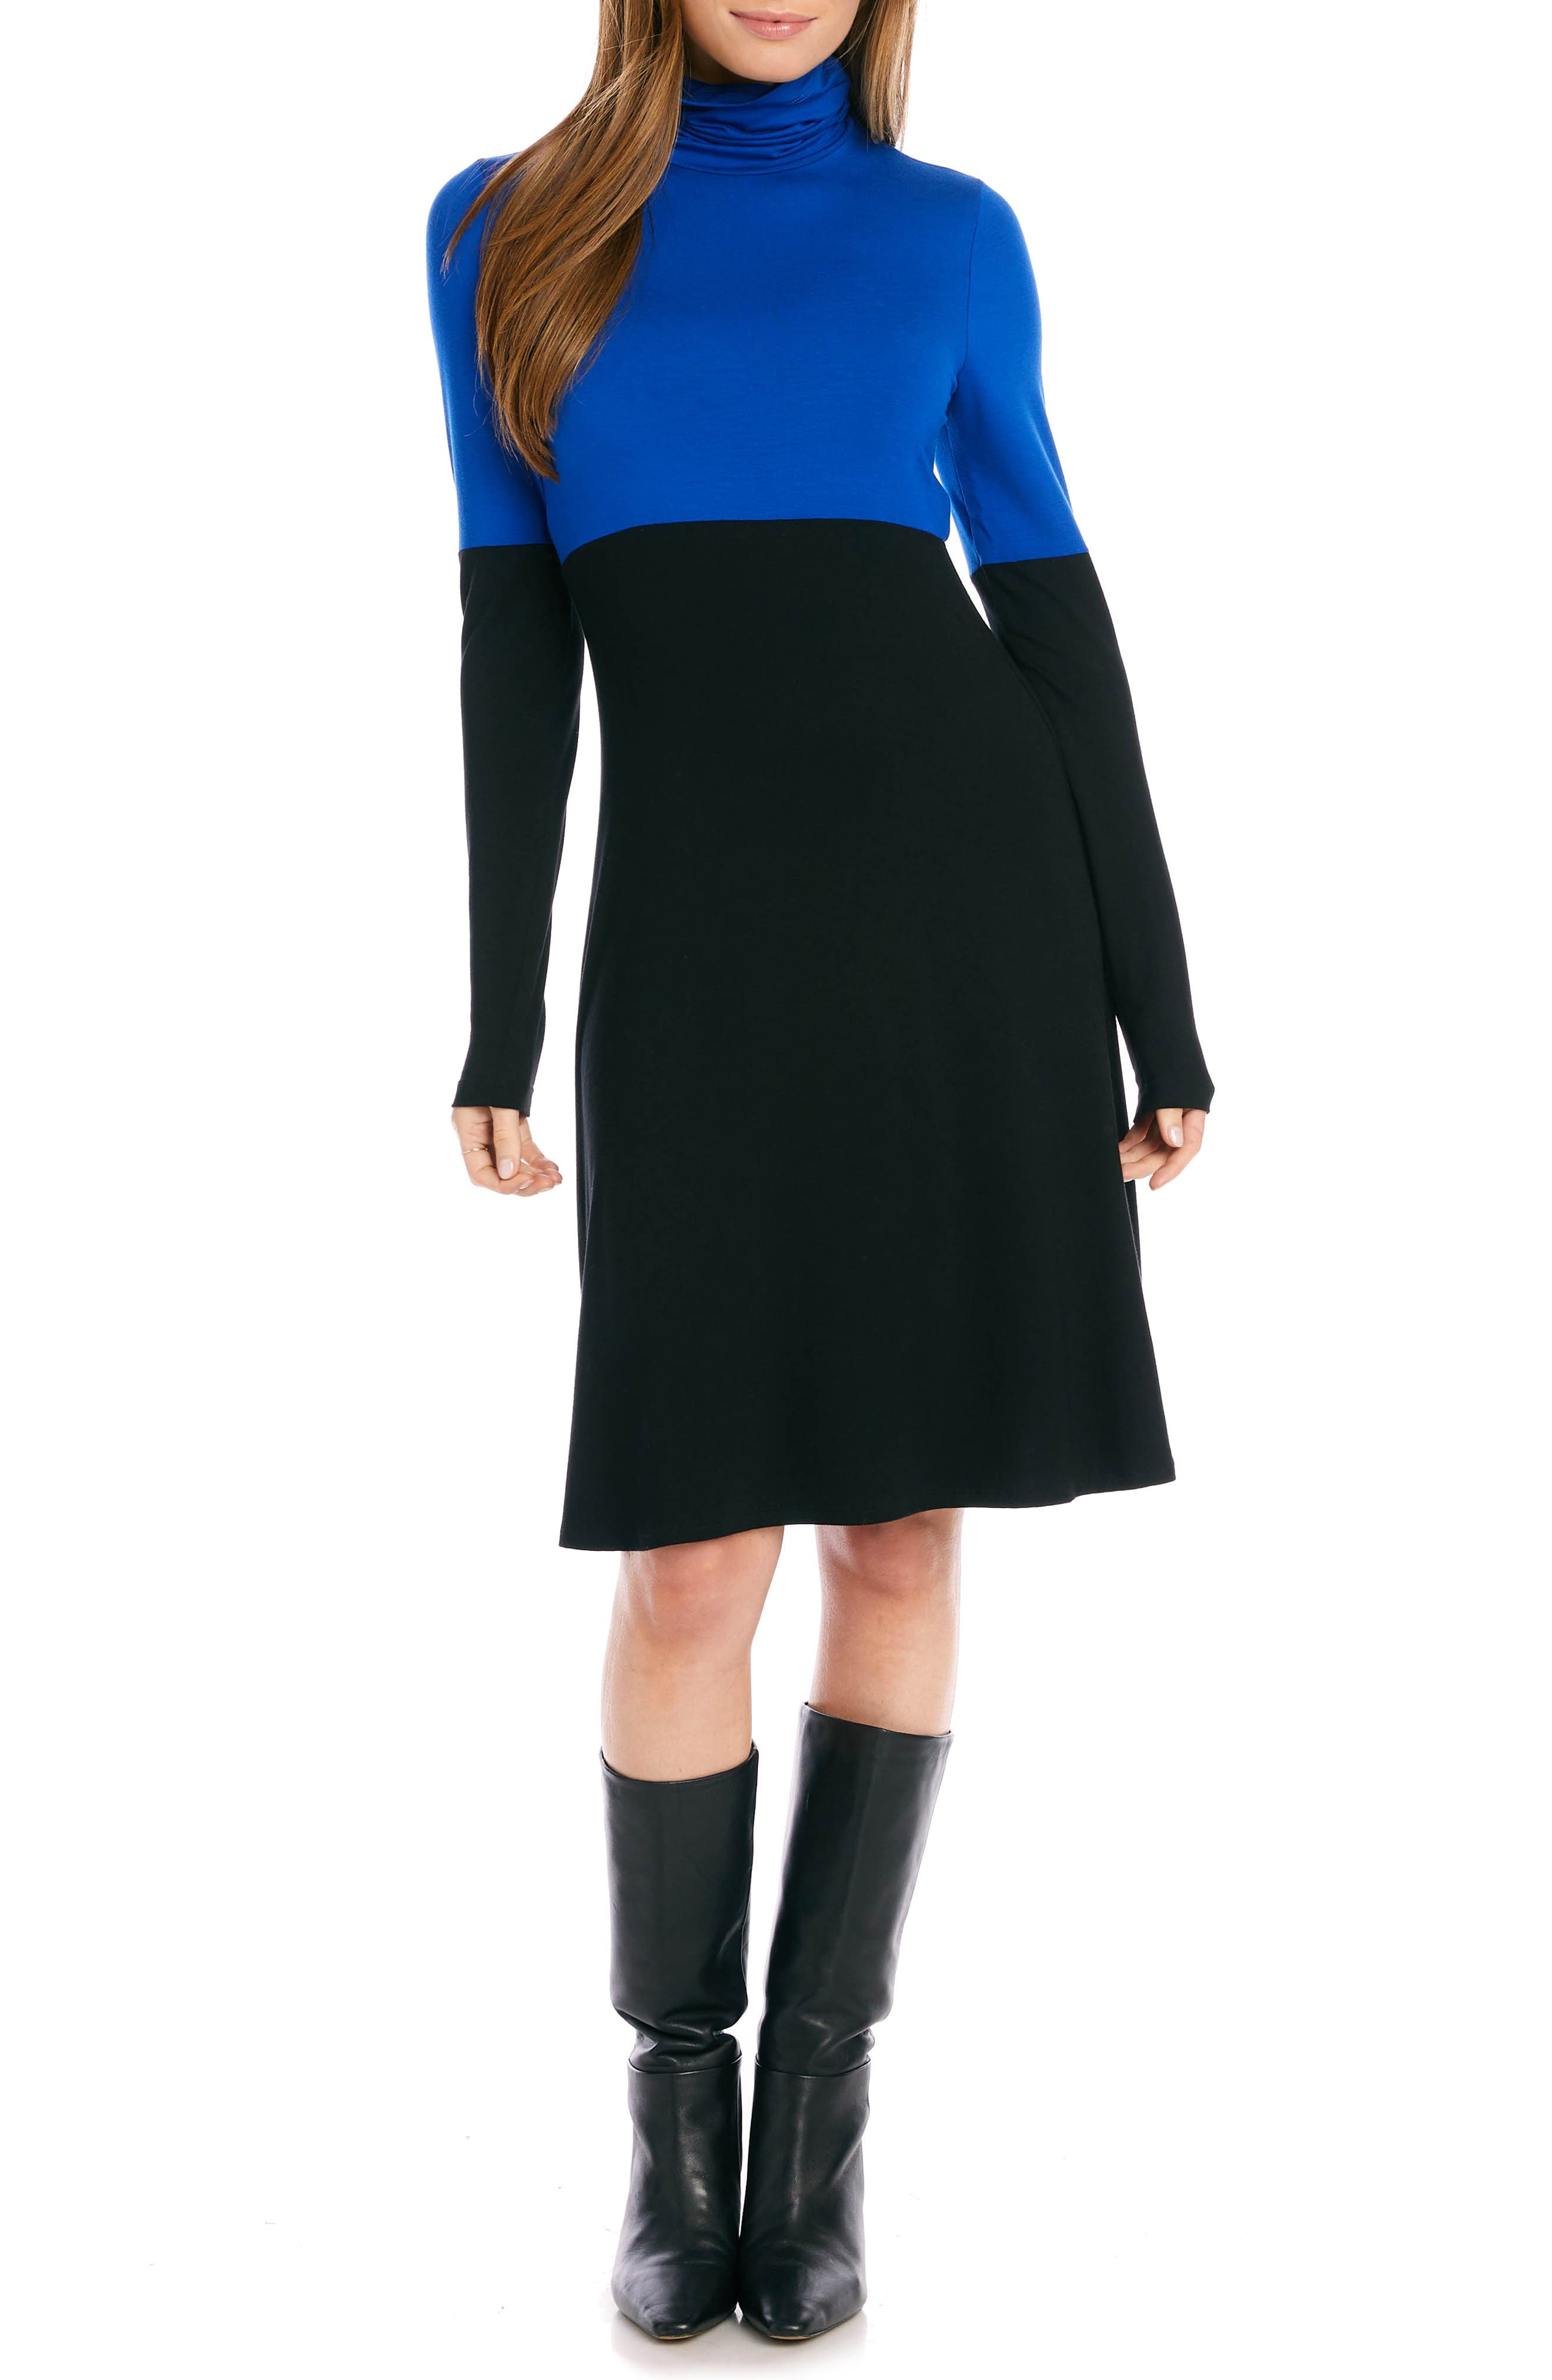 Colorblock Long Sleeve Turtleneck Jersey Dress